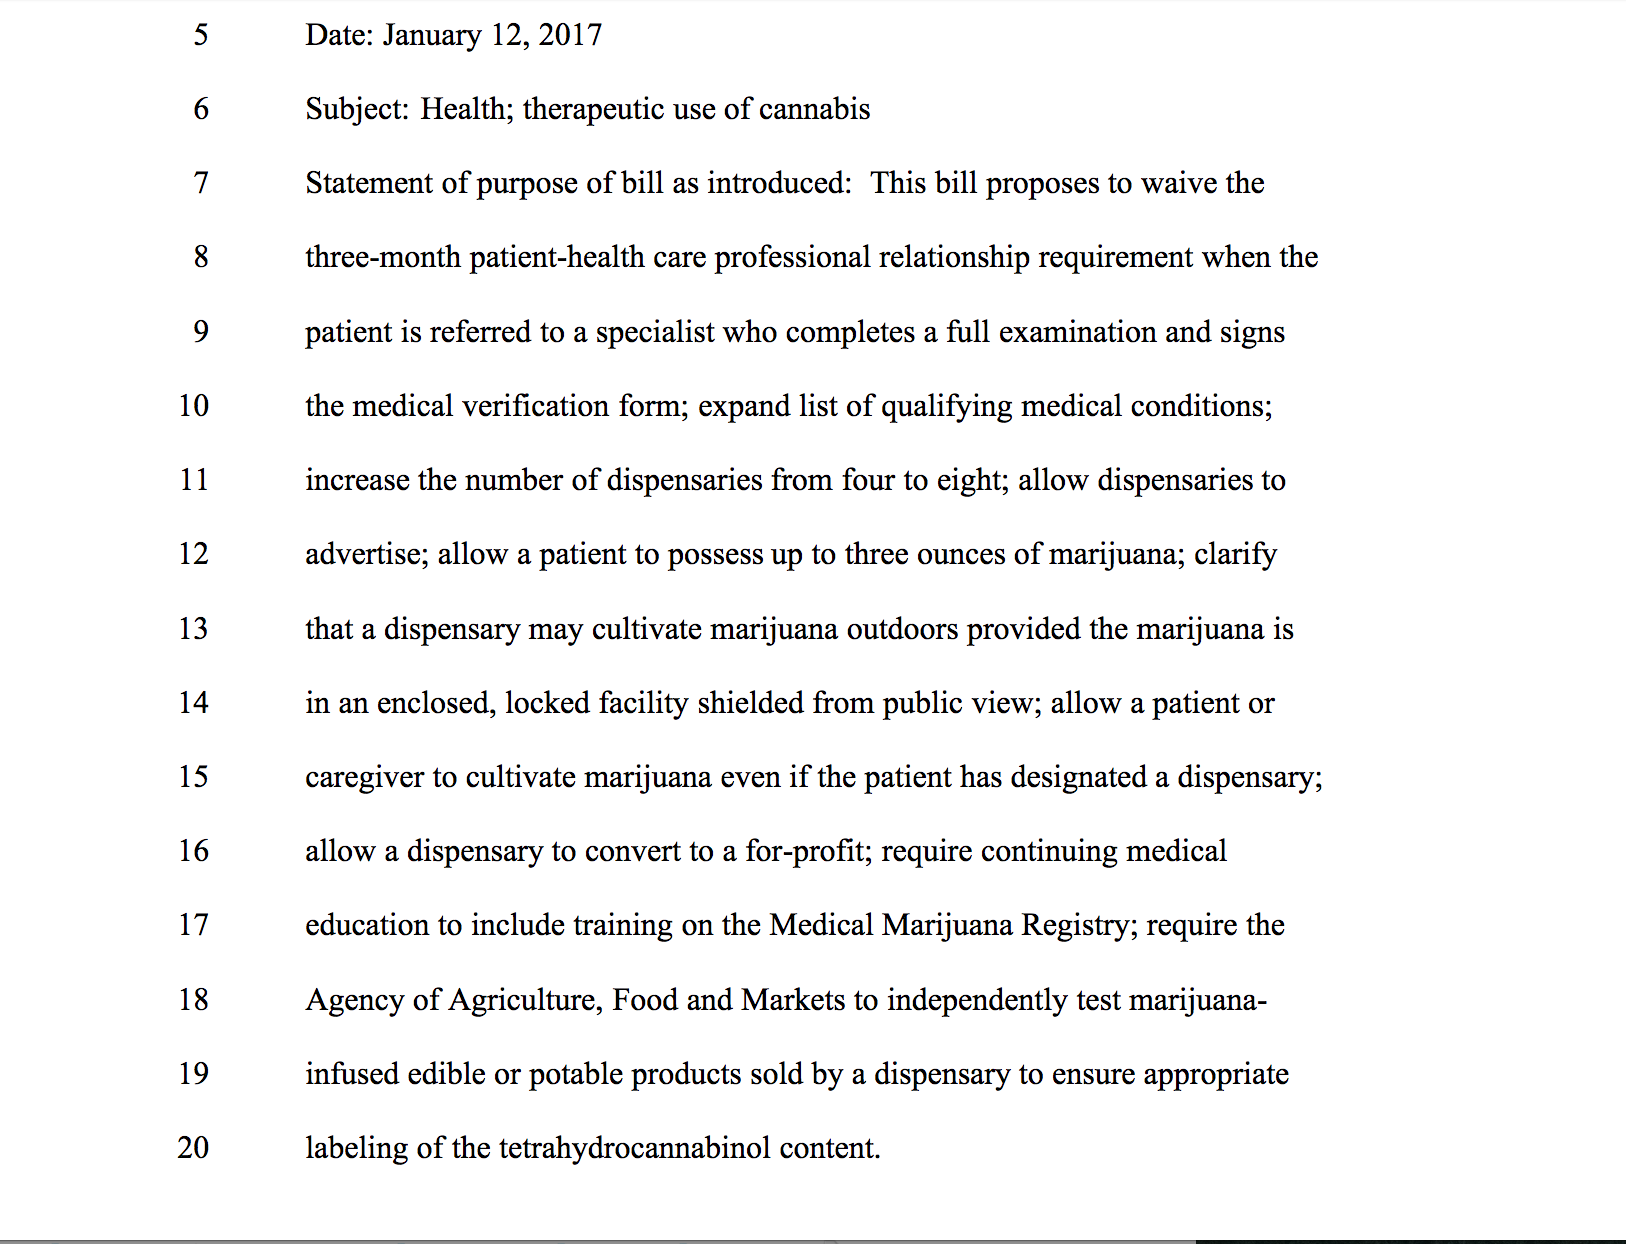 http://legislature.vermont.gov/assets/Documents/2018/Docs/BILLS/S-0016/S-0016%20As%20Passed%20by%20the%20Senate%20Official.pdf